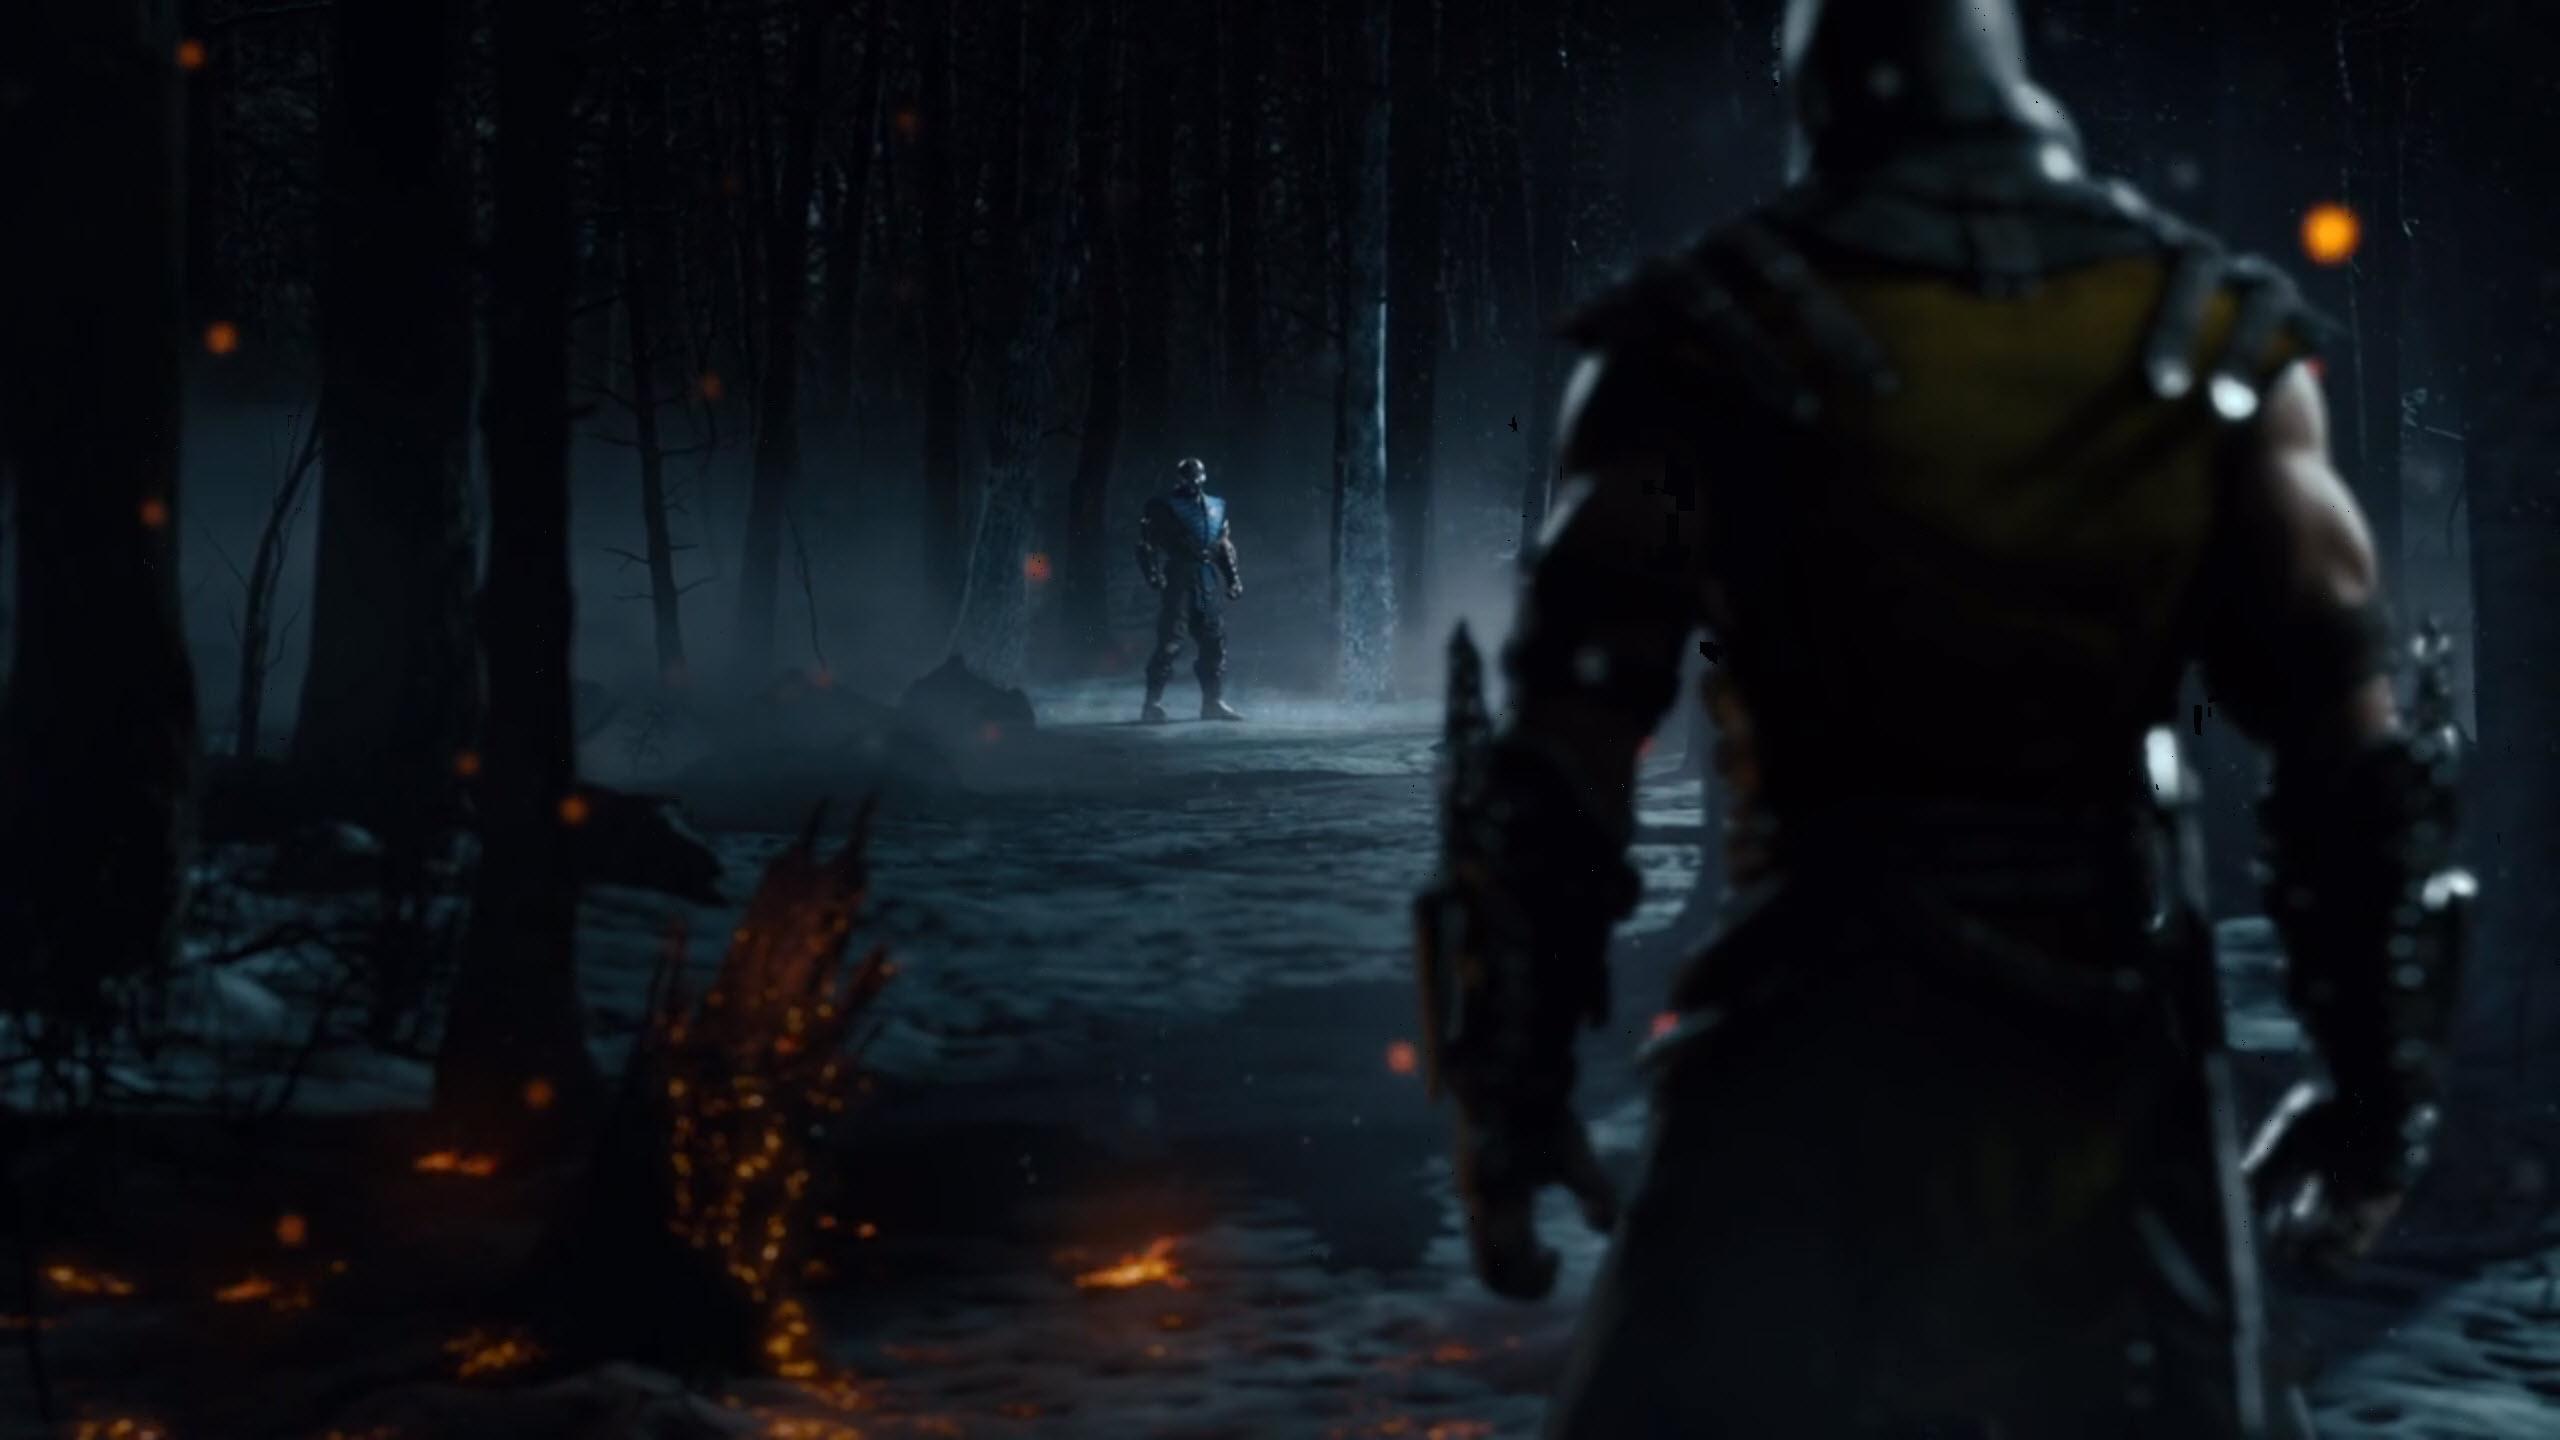 Mortal Kombat X Computer Wallpapers Desktop Backgrounds 2560x1440 2560x1440